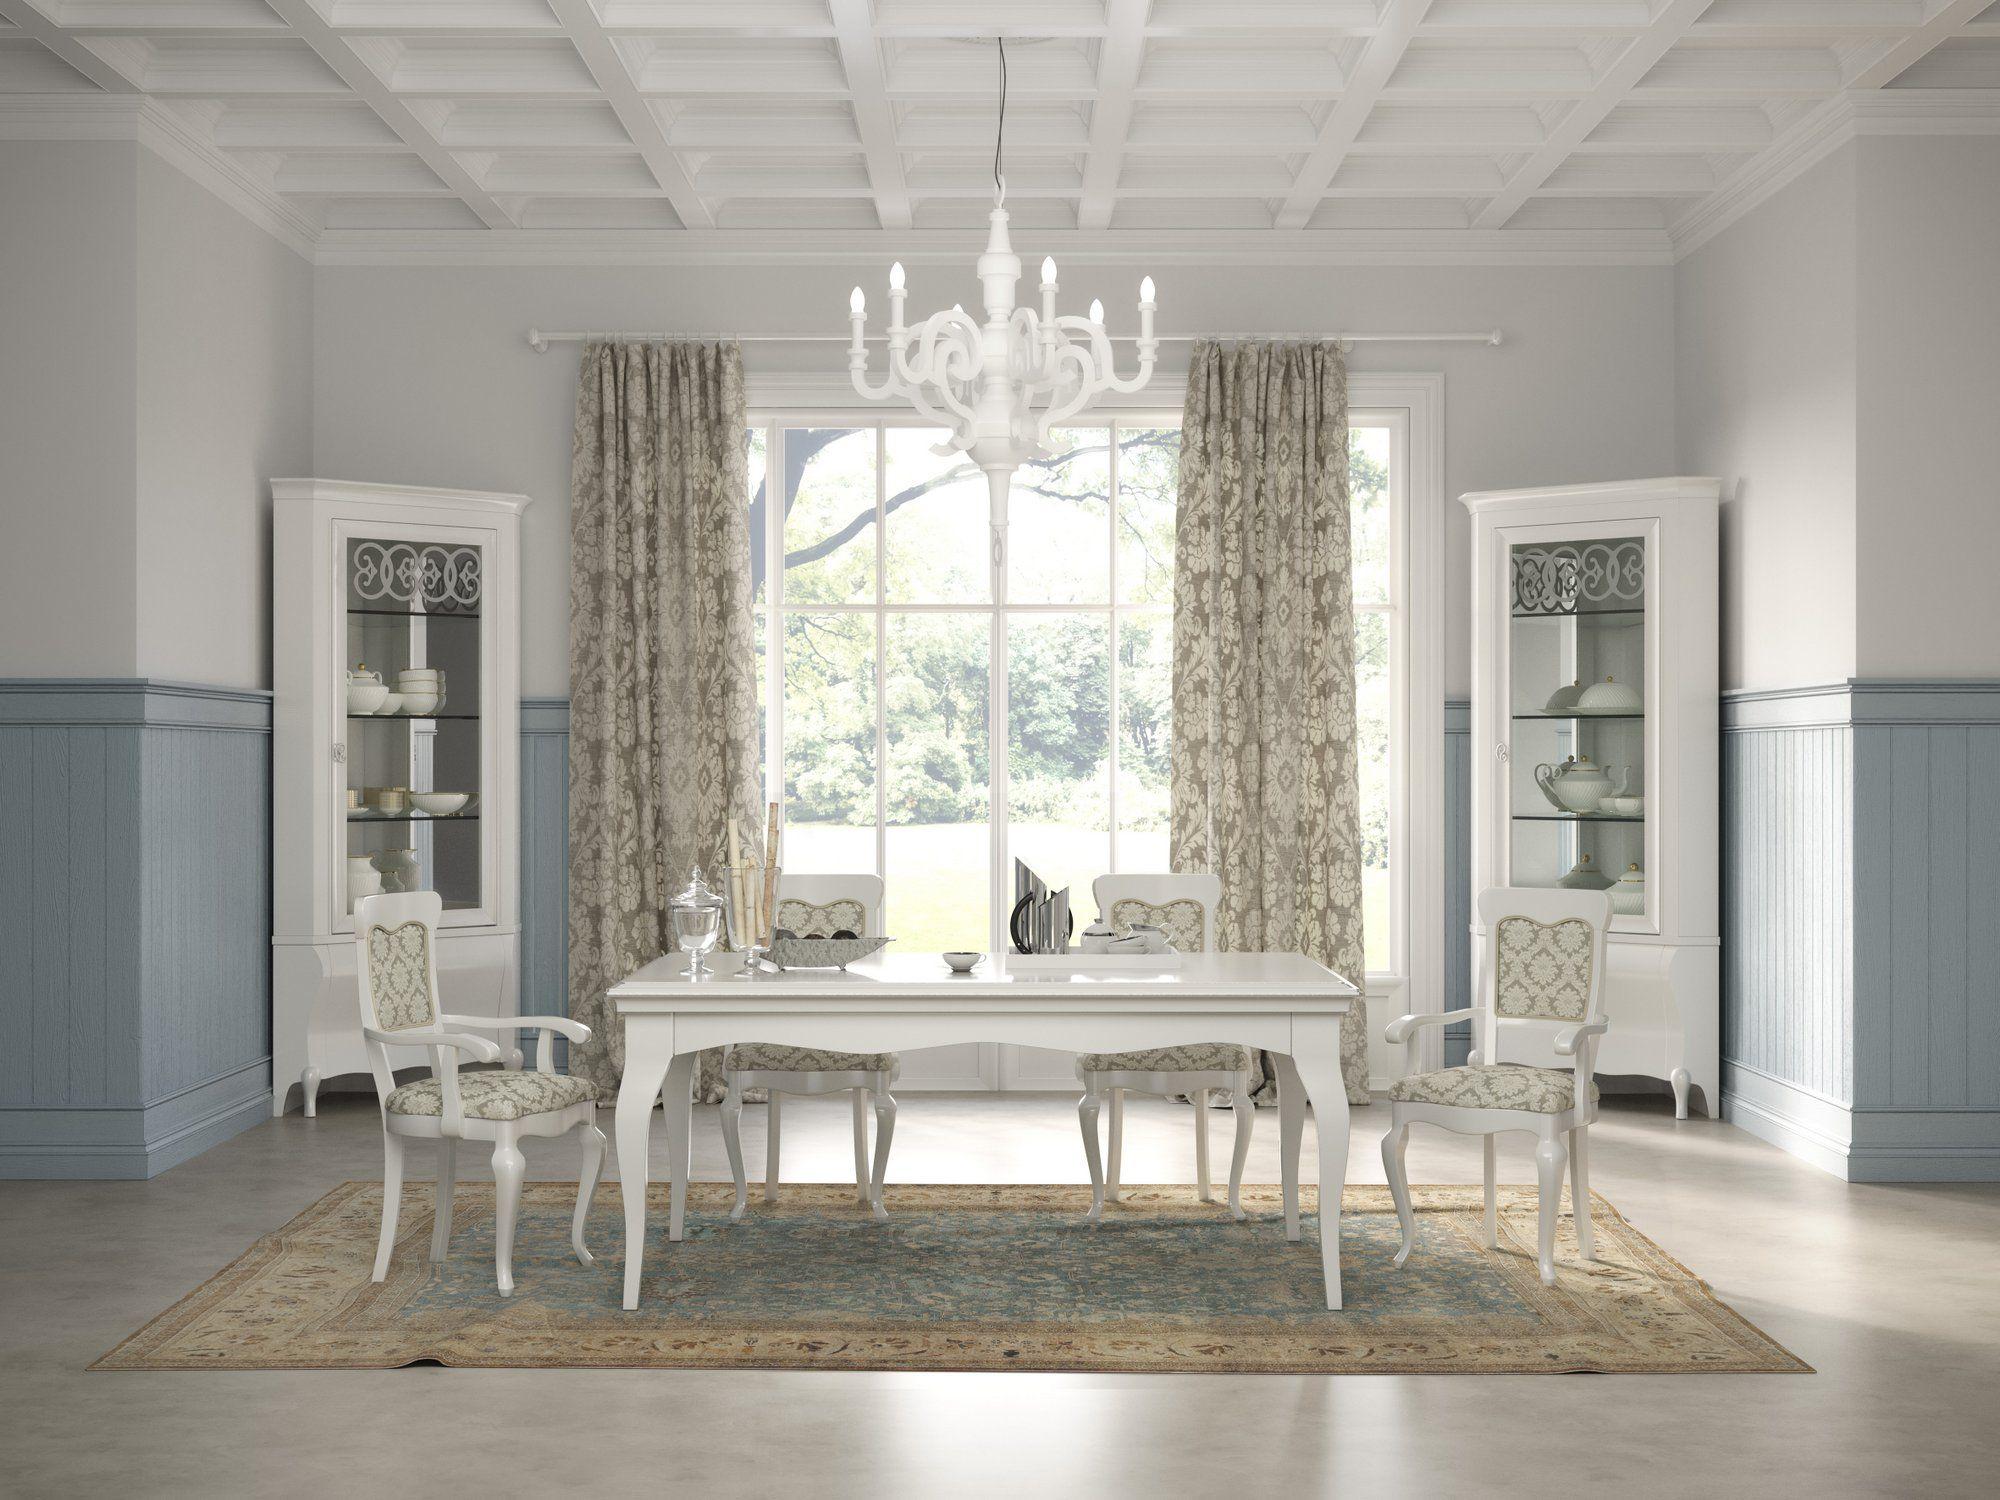 Leroy merlin lampade da parete - Dall agnese mobili classici ...